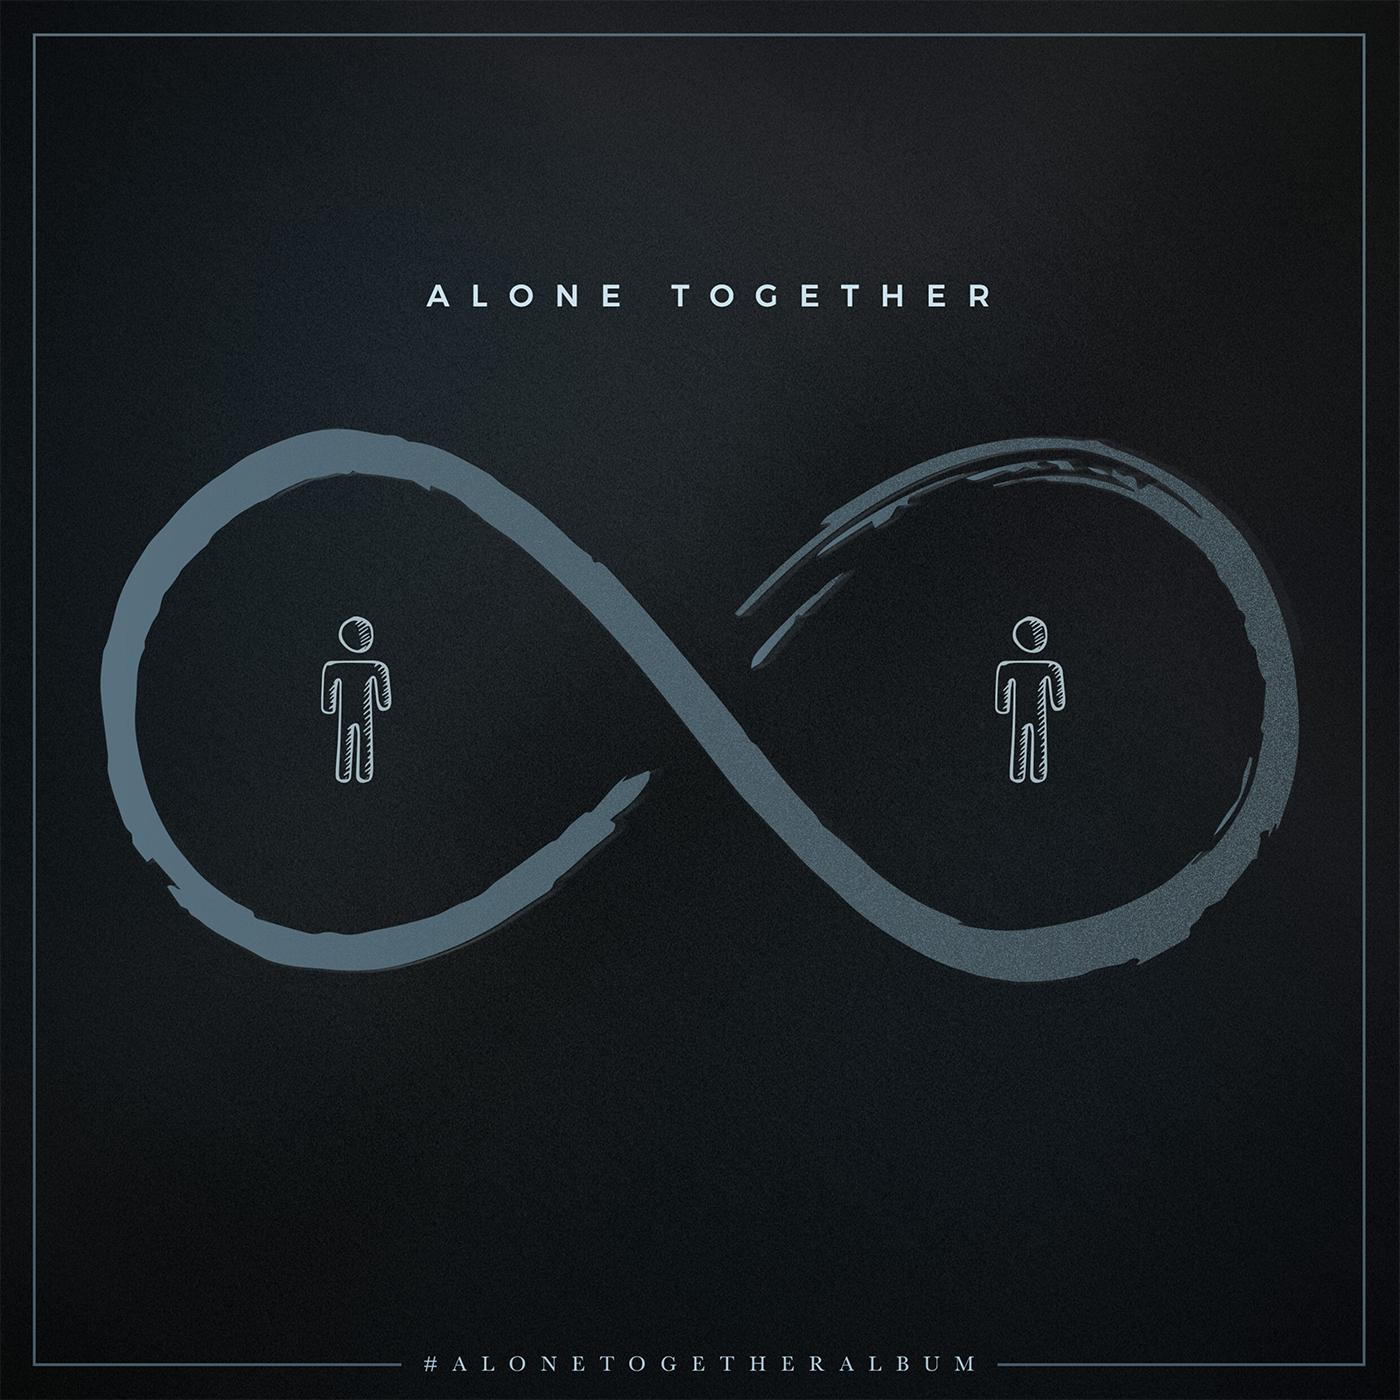 alone together amuse album art